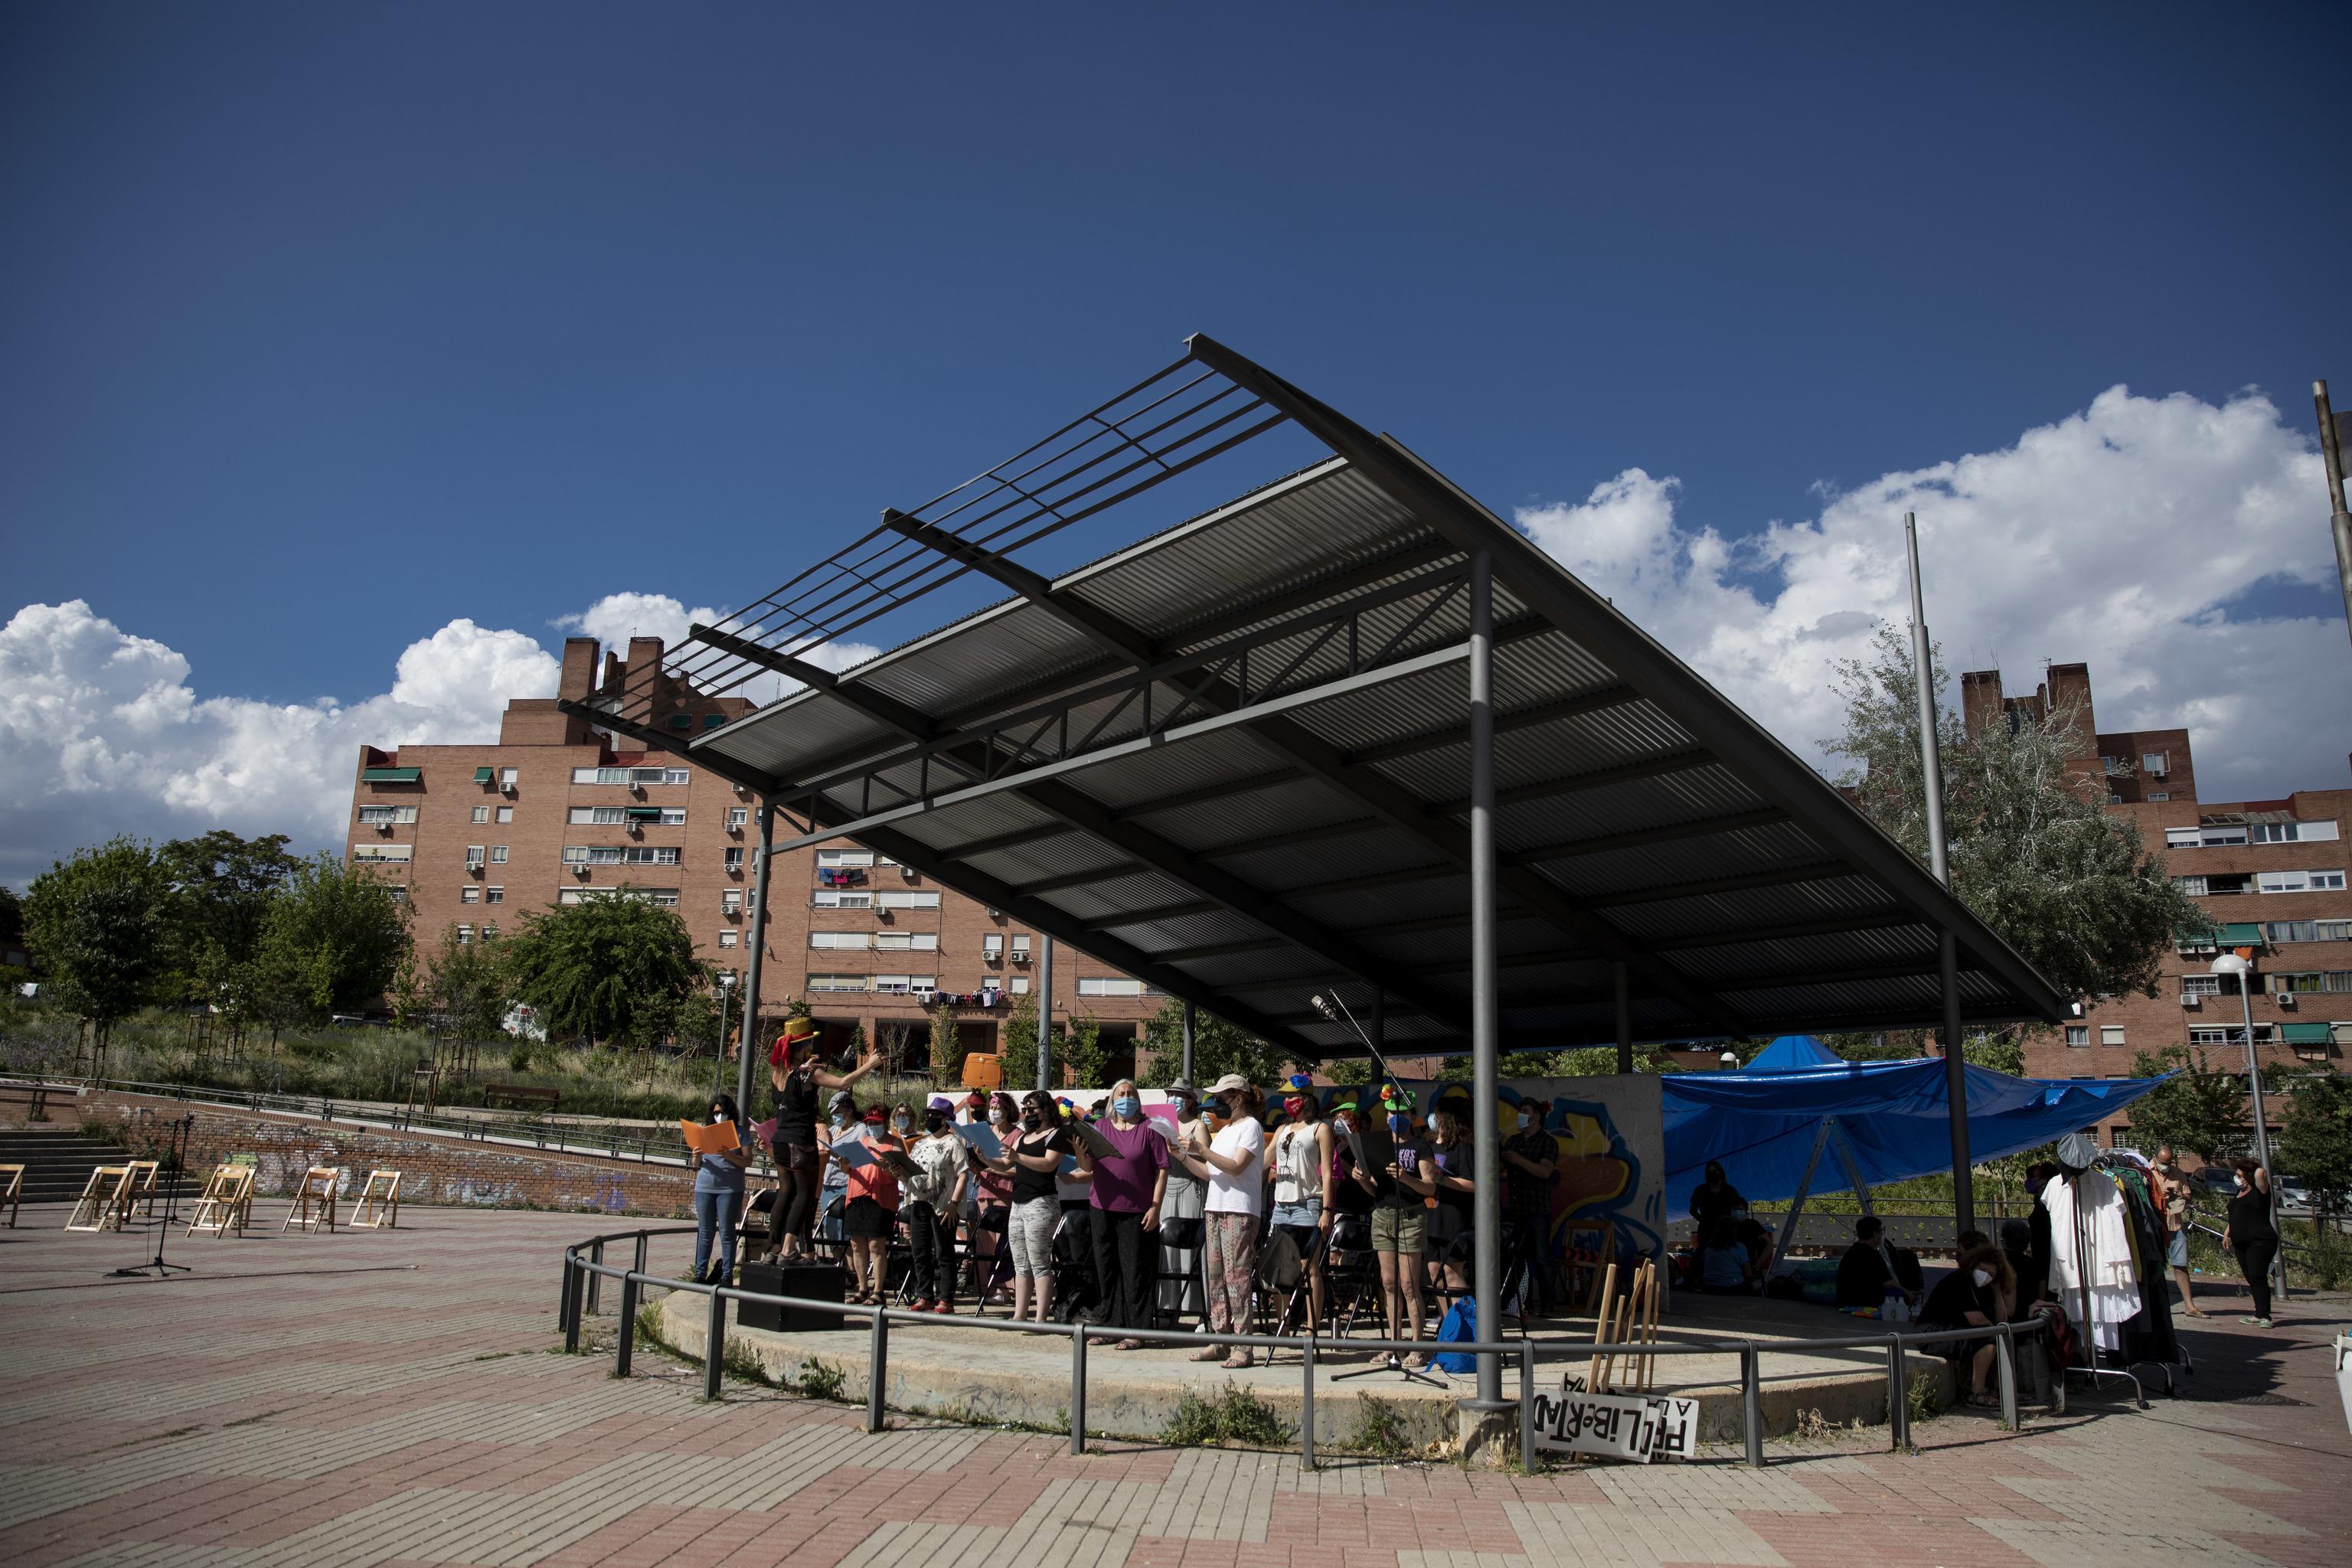 Ensayo de la zarzuela en la plaza de Carlos Jiménez de Parga.